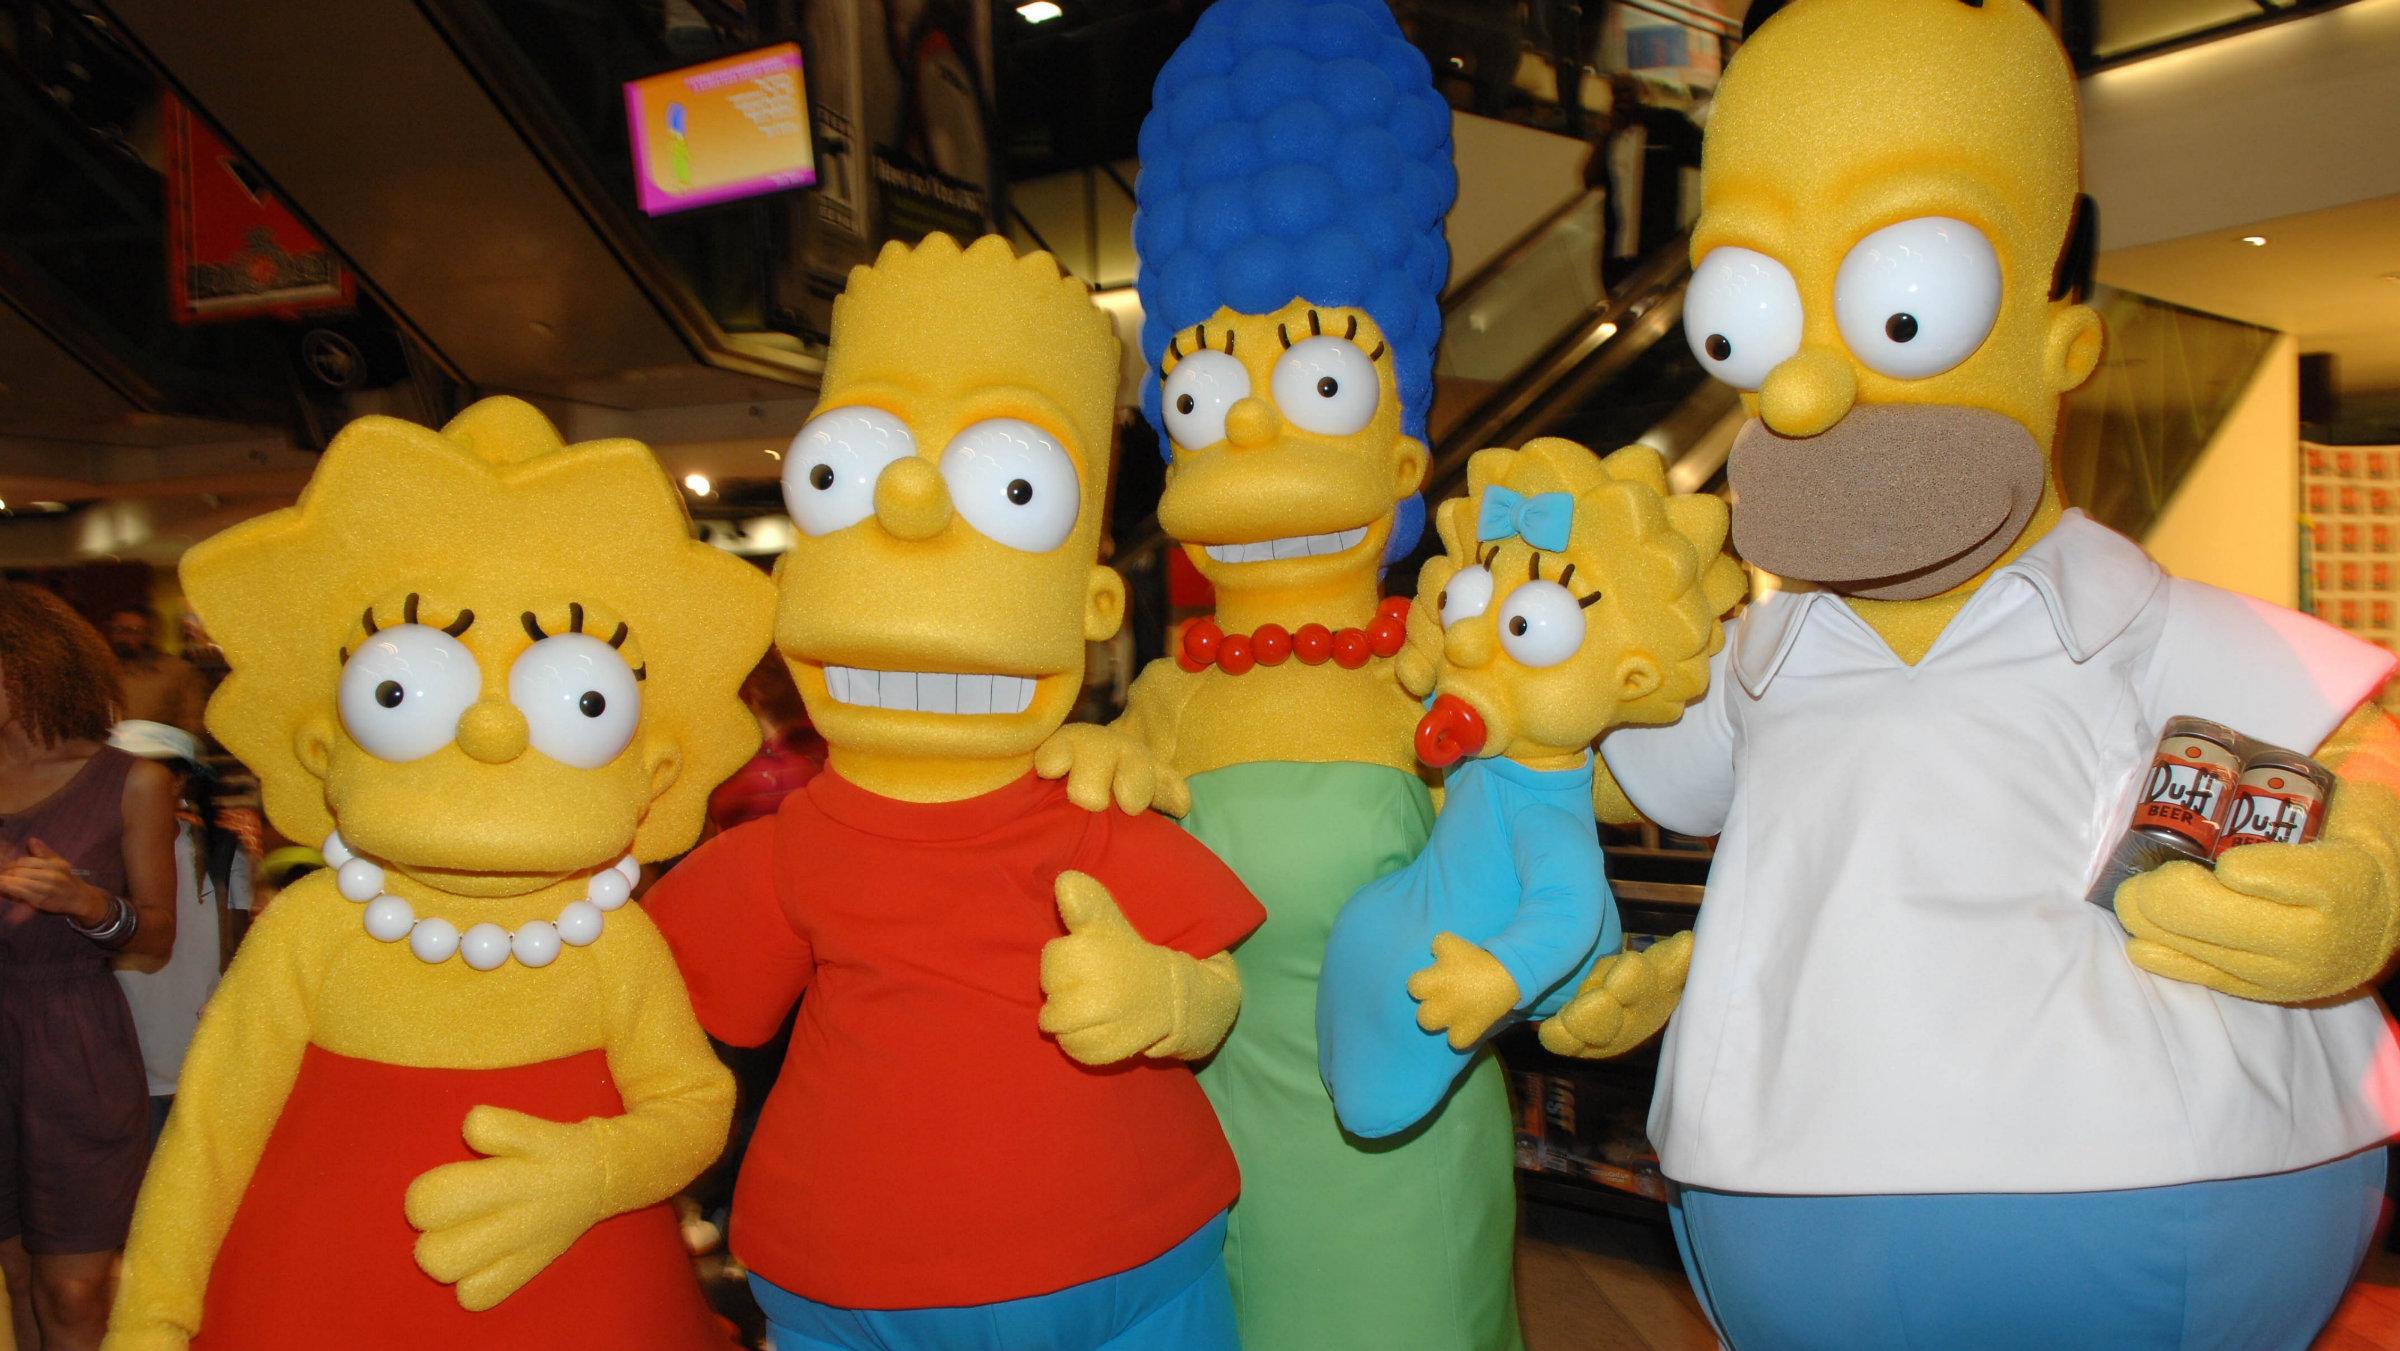 The Simpsons Stream